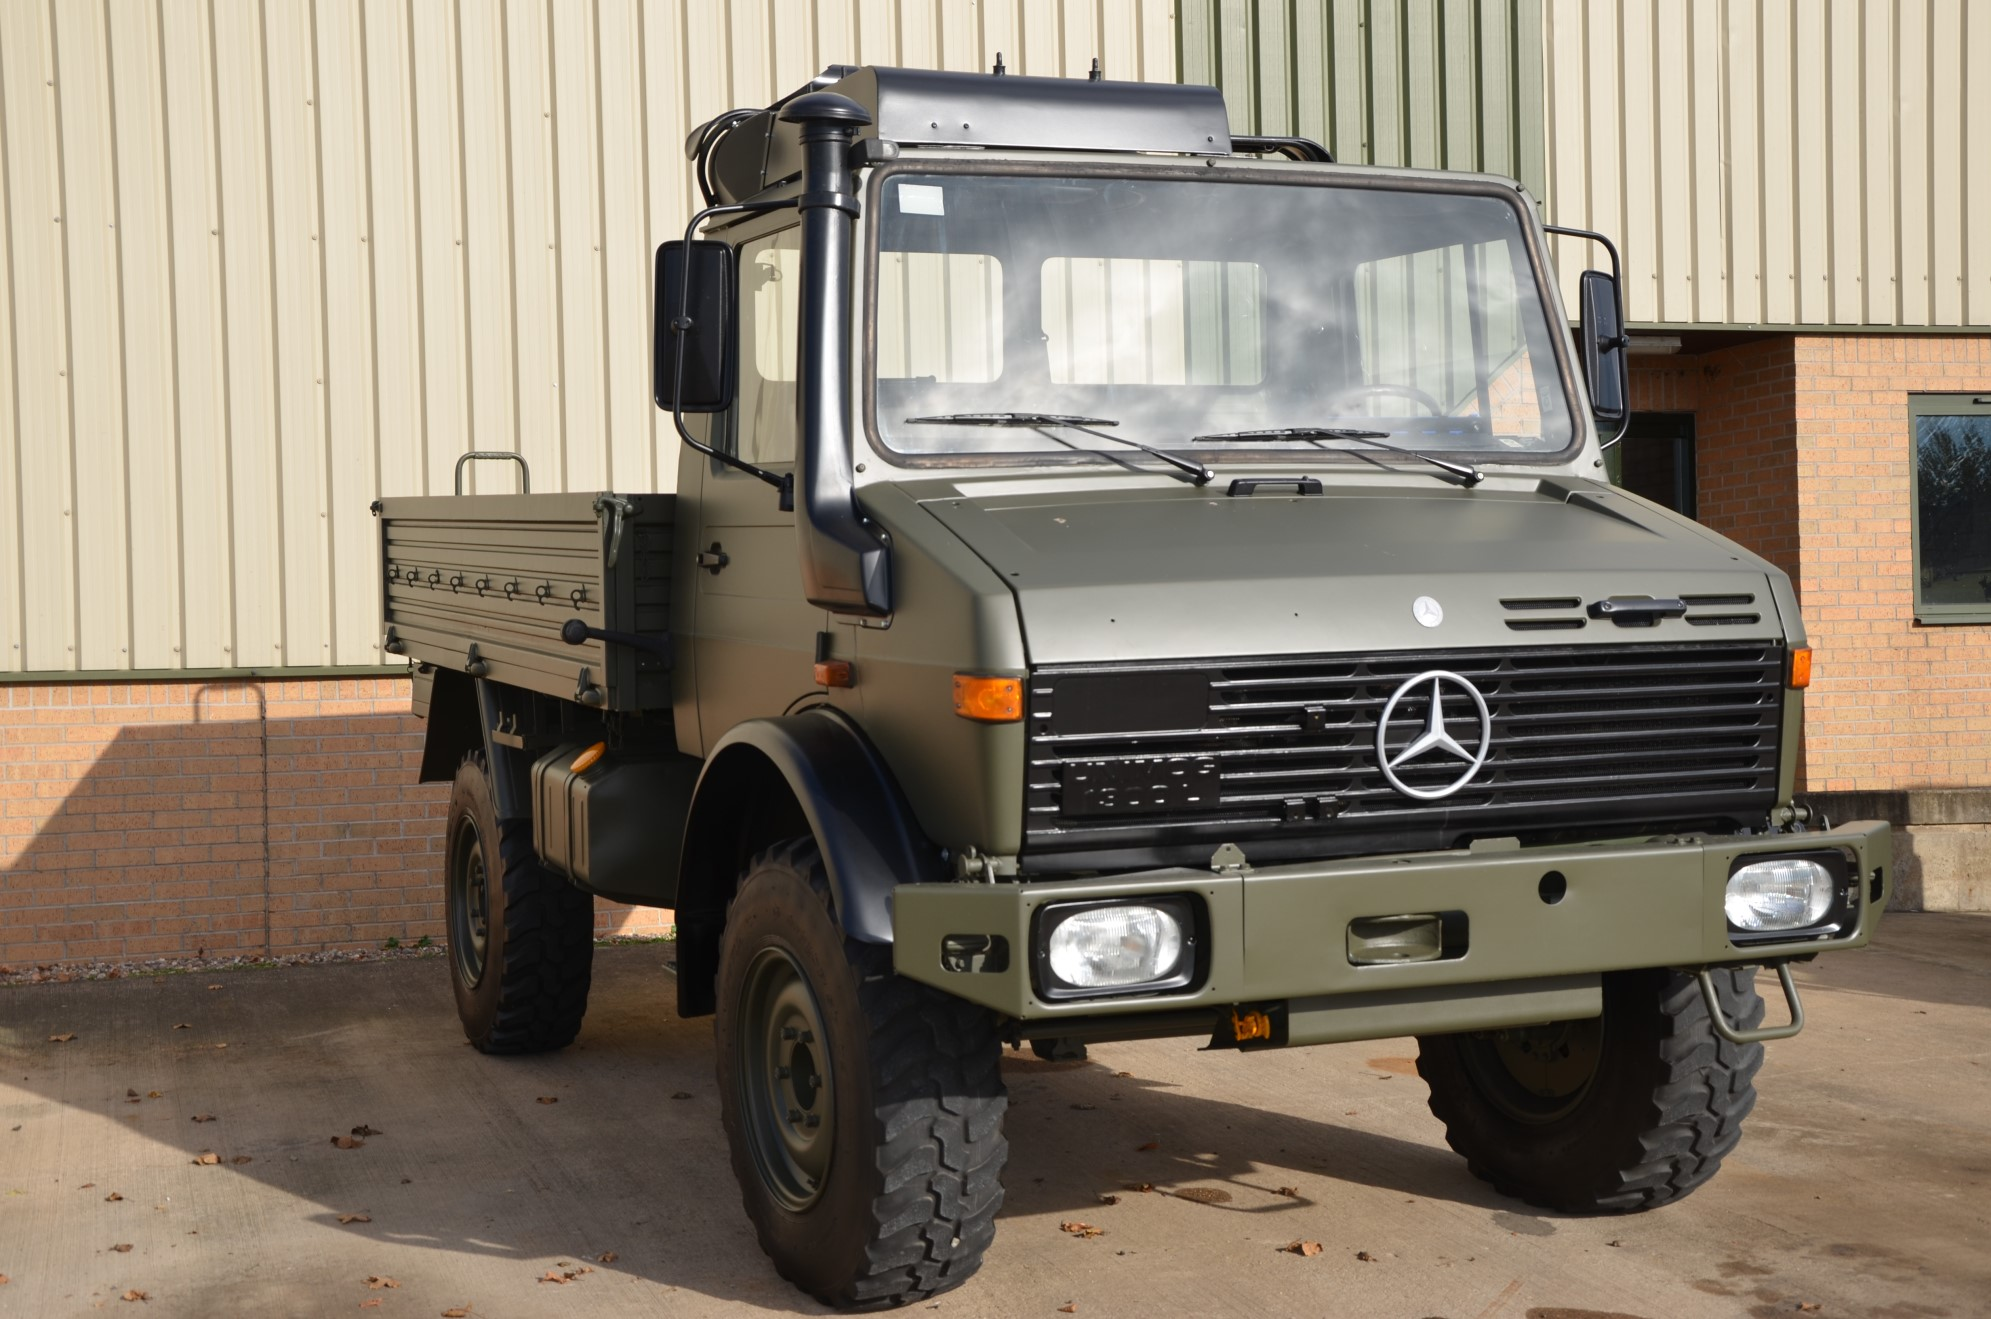 Mercedes Unimog  U1300L 4x4 Drop Side Cargo Truck for sale | military vehicles